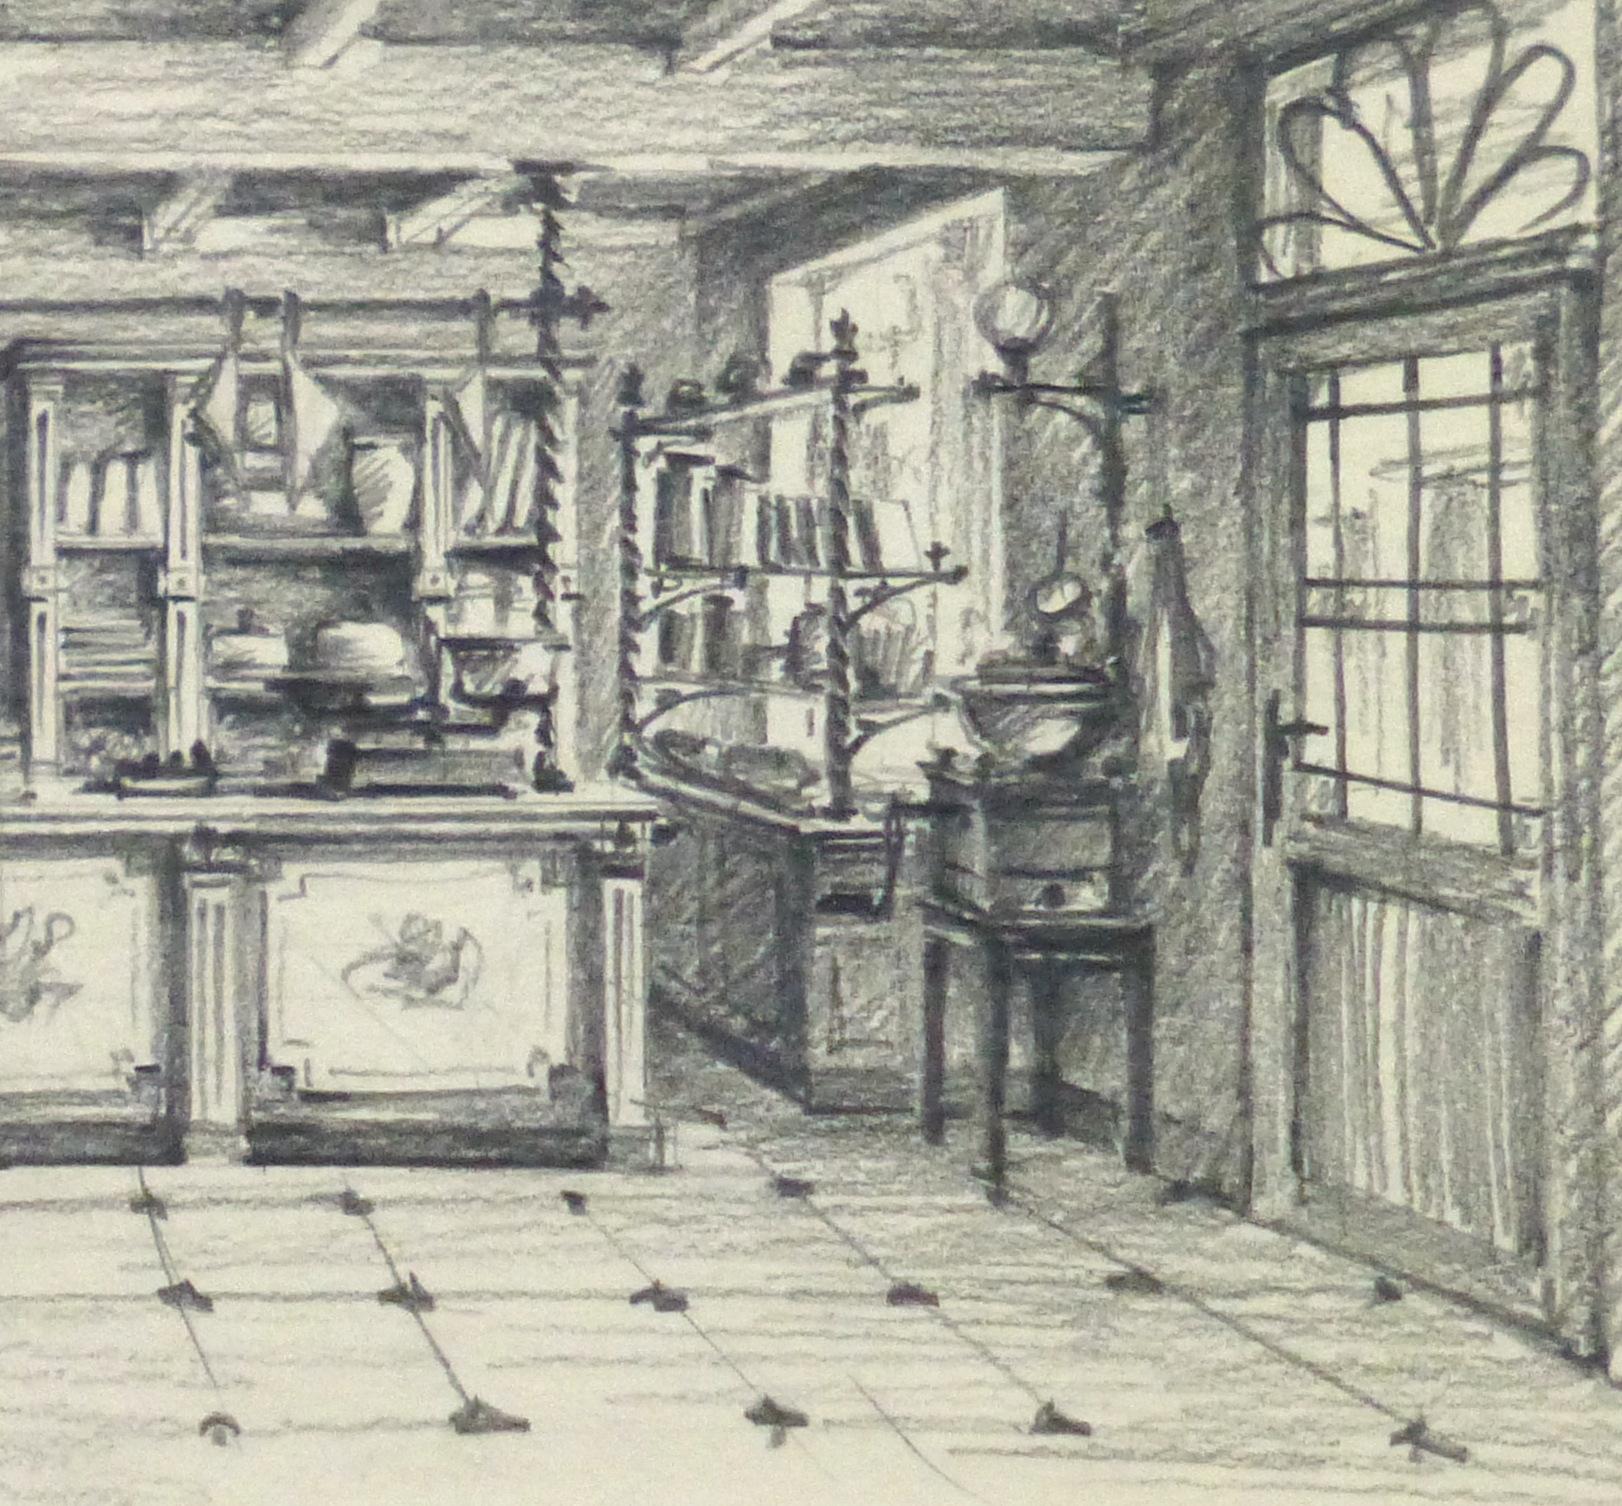 Pencil Drawing - General Store, circa 1950-detail-10366M